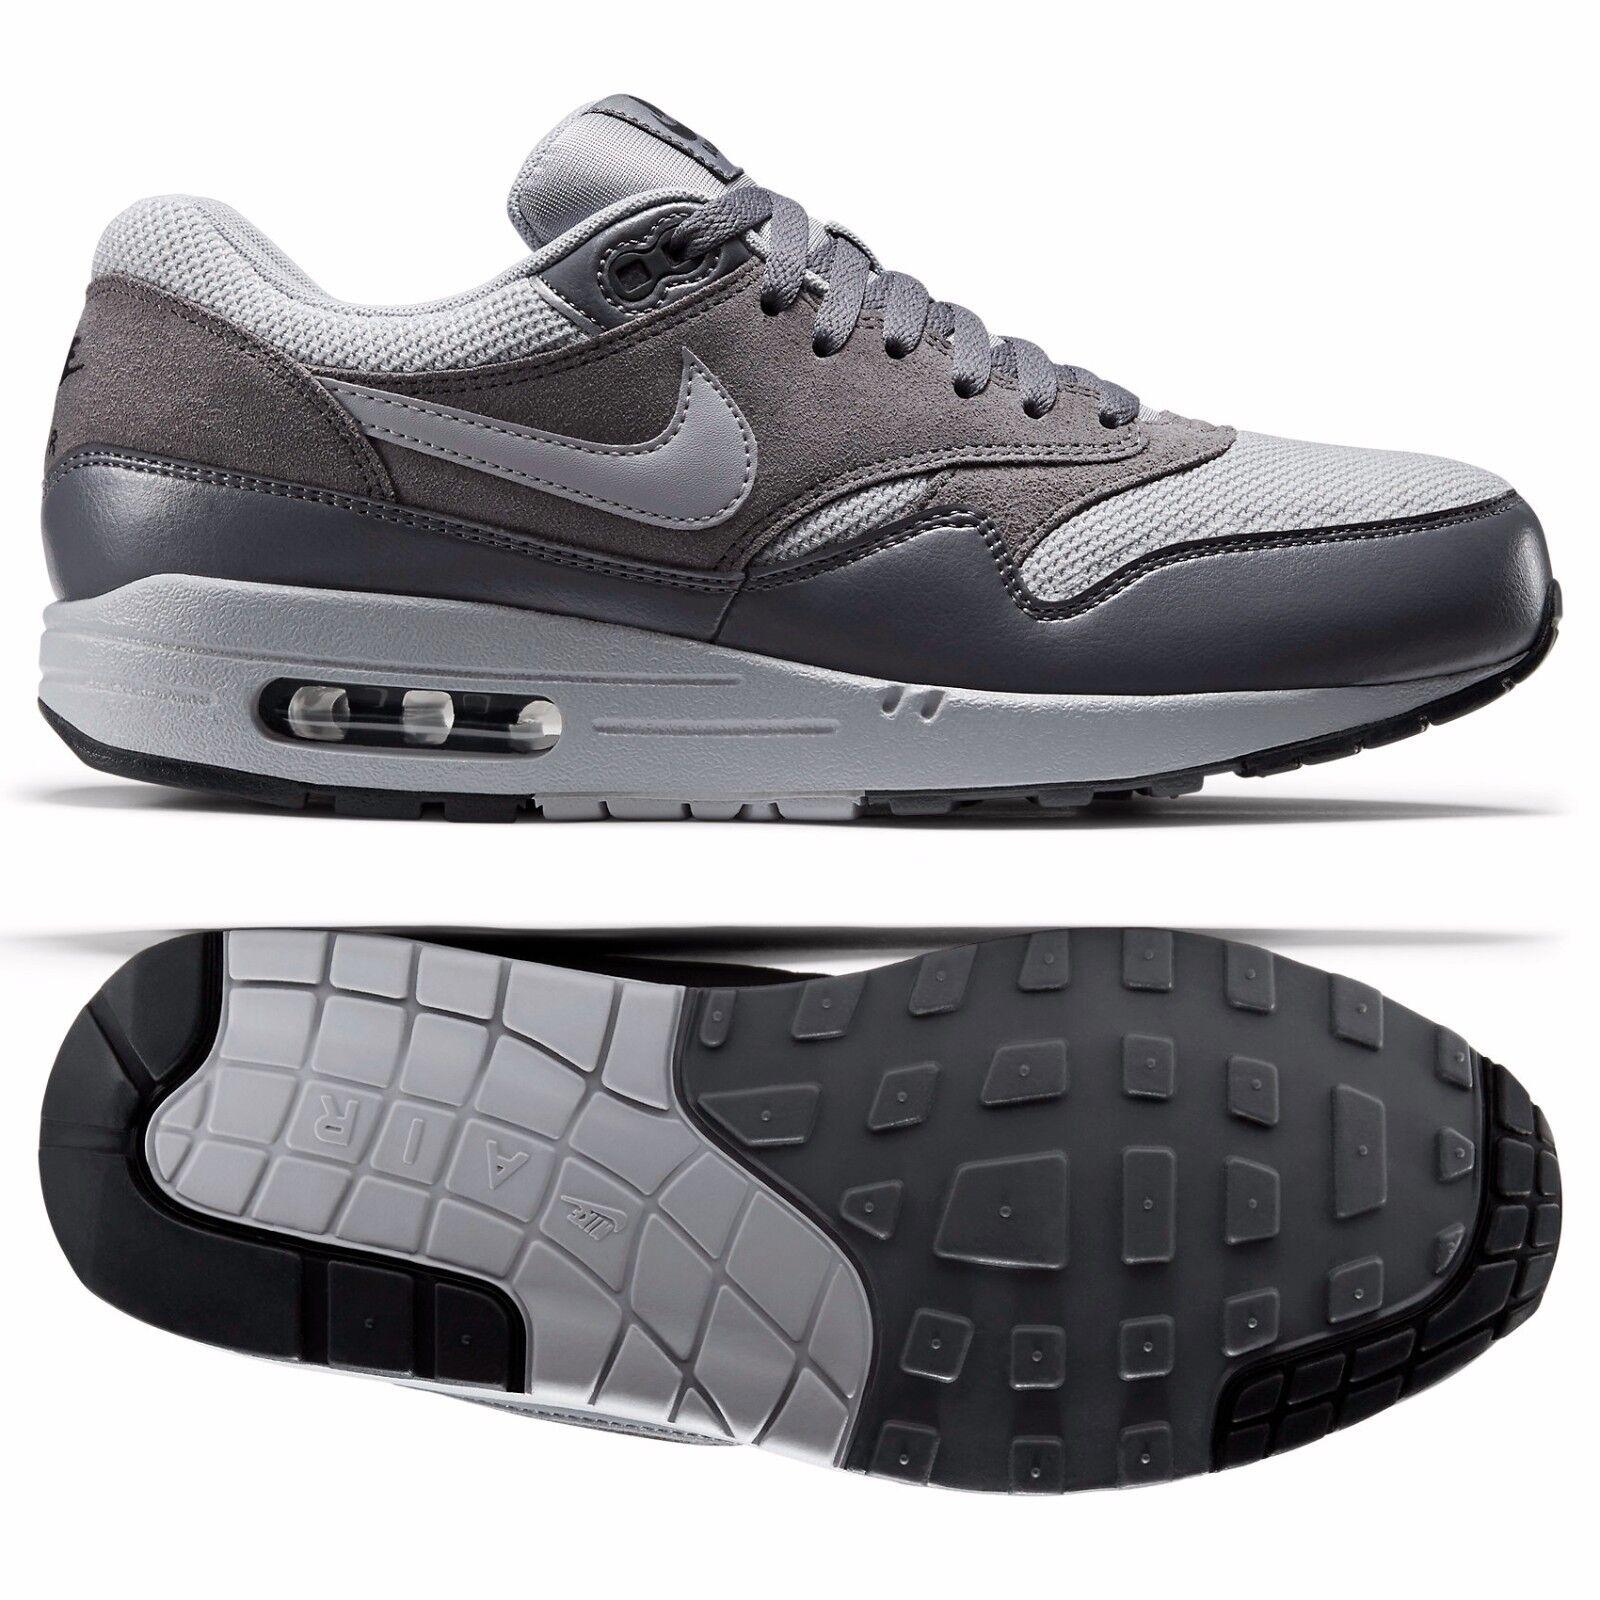 Nike Air Max 1 Essential 537383 019 Wolf GreyDark Grey Leather Men's Shoes